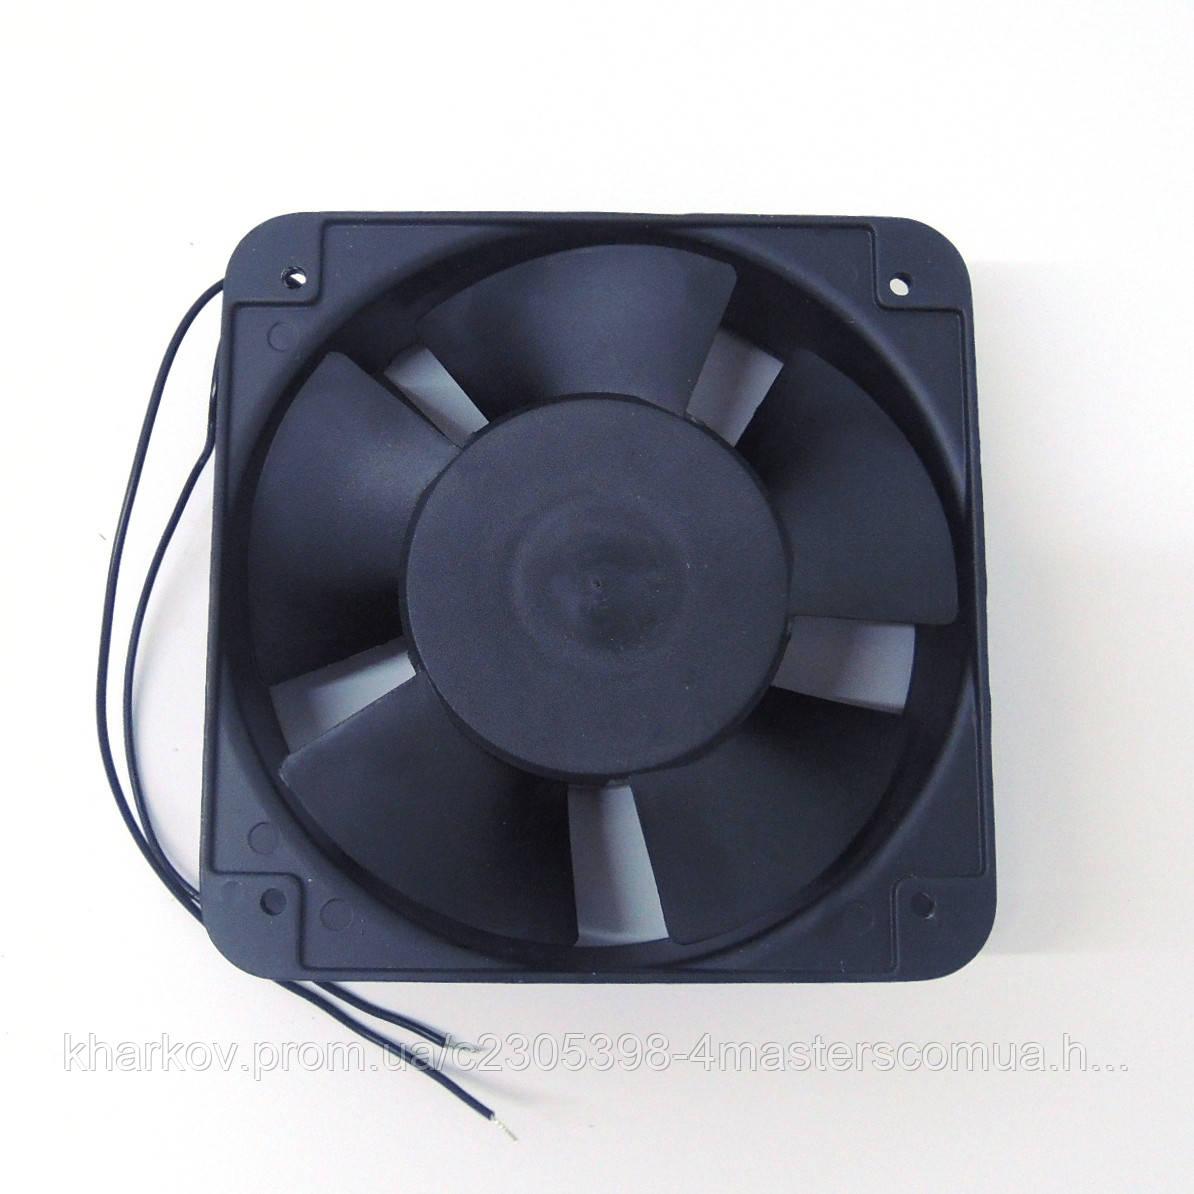 Вентилятор 220 V 120x120х38 (0.14A/23W)